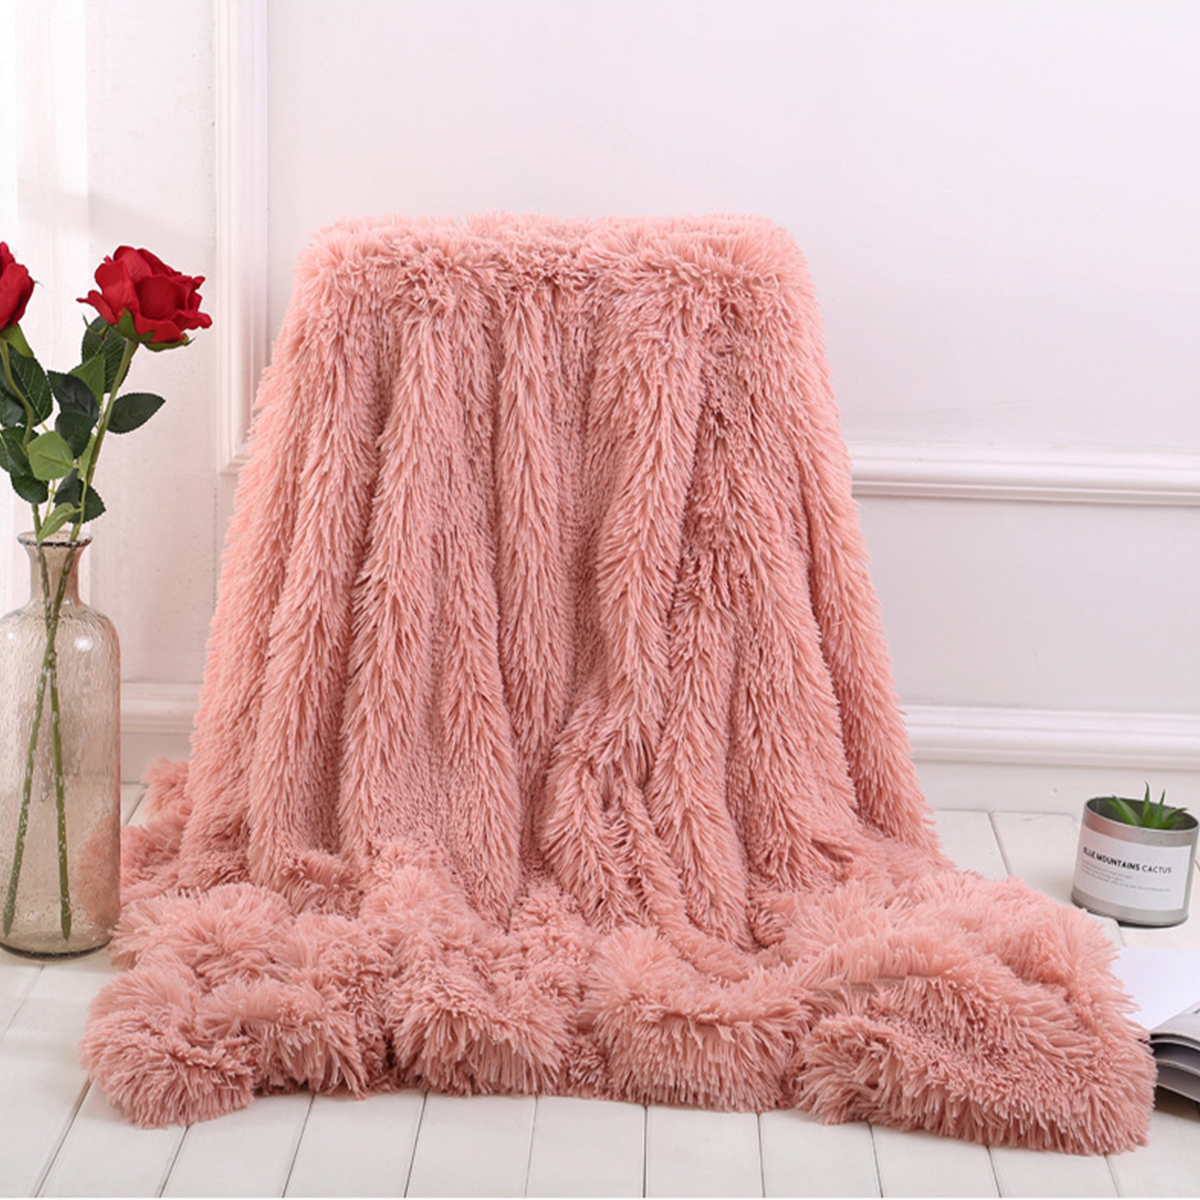 60X70 Throw Cream, 60X70 Throw Reafort Luxury Long Hair PV Fur Faux Fur Oversize Throw Blanket